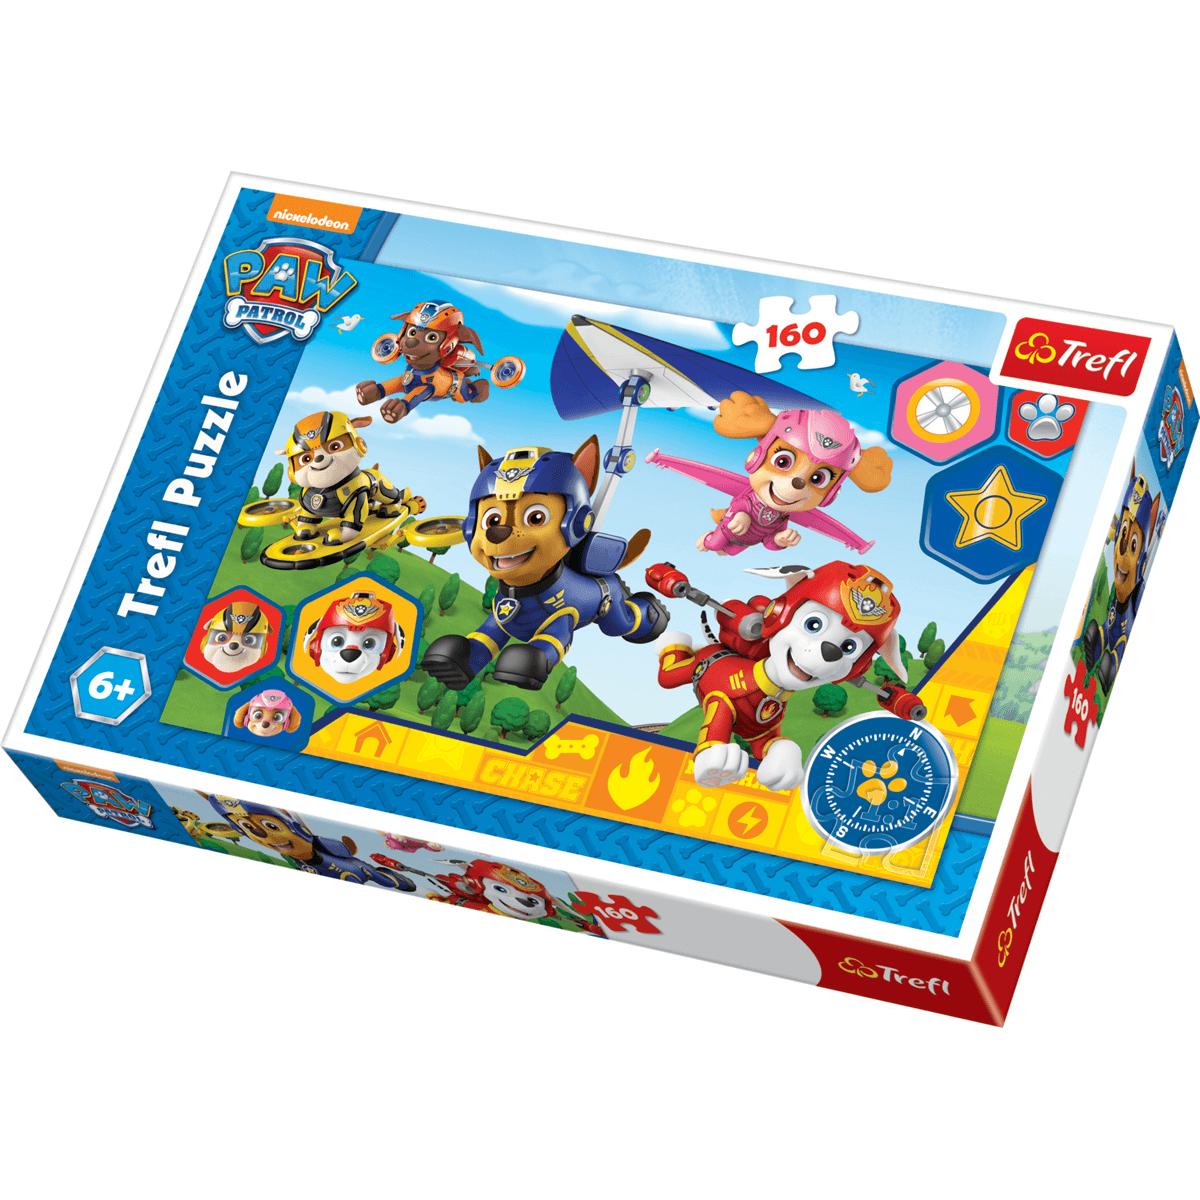 Trefl - Paw Patrol 160pc Puzzle